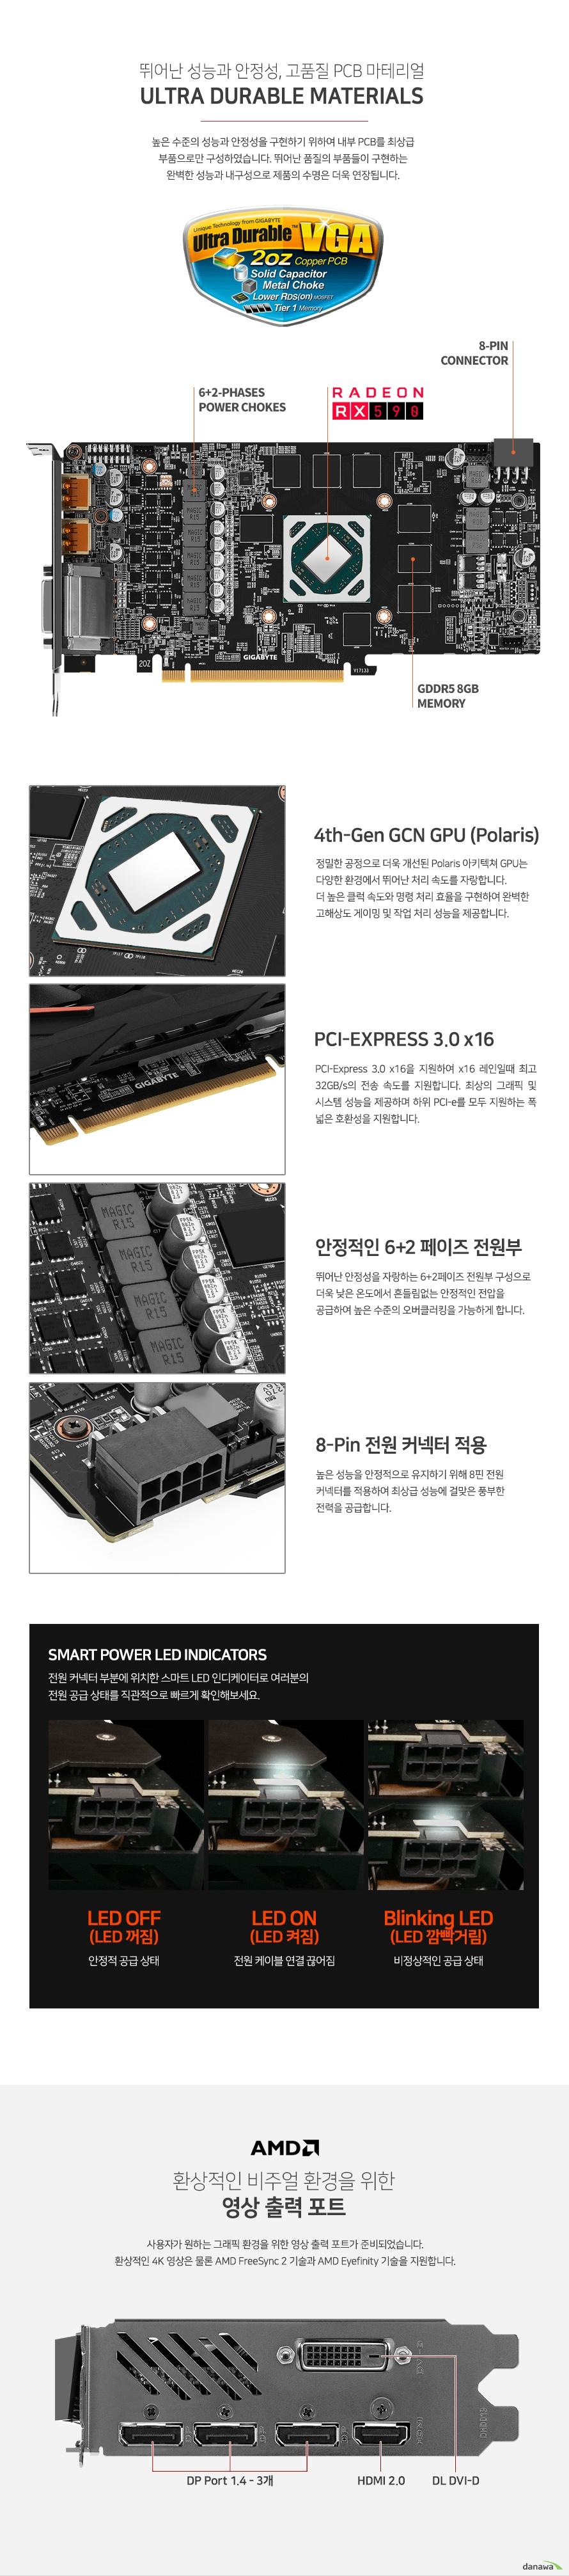 GIGABYTE  라데온 RX 590 Gaming D5 8GB